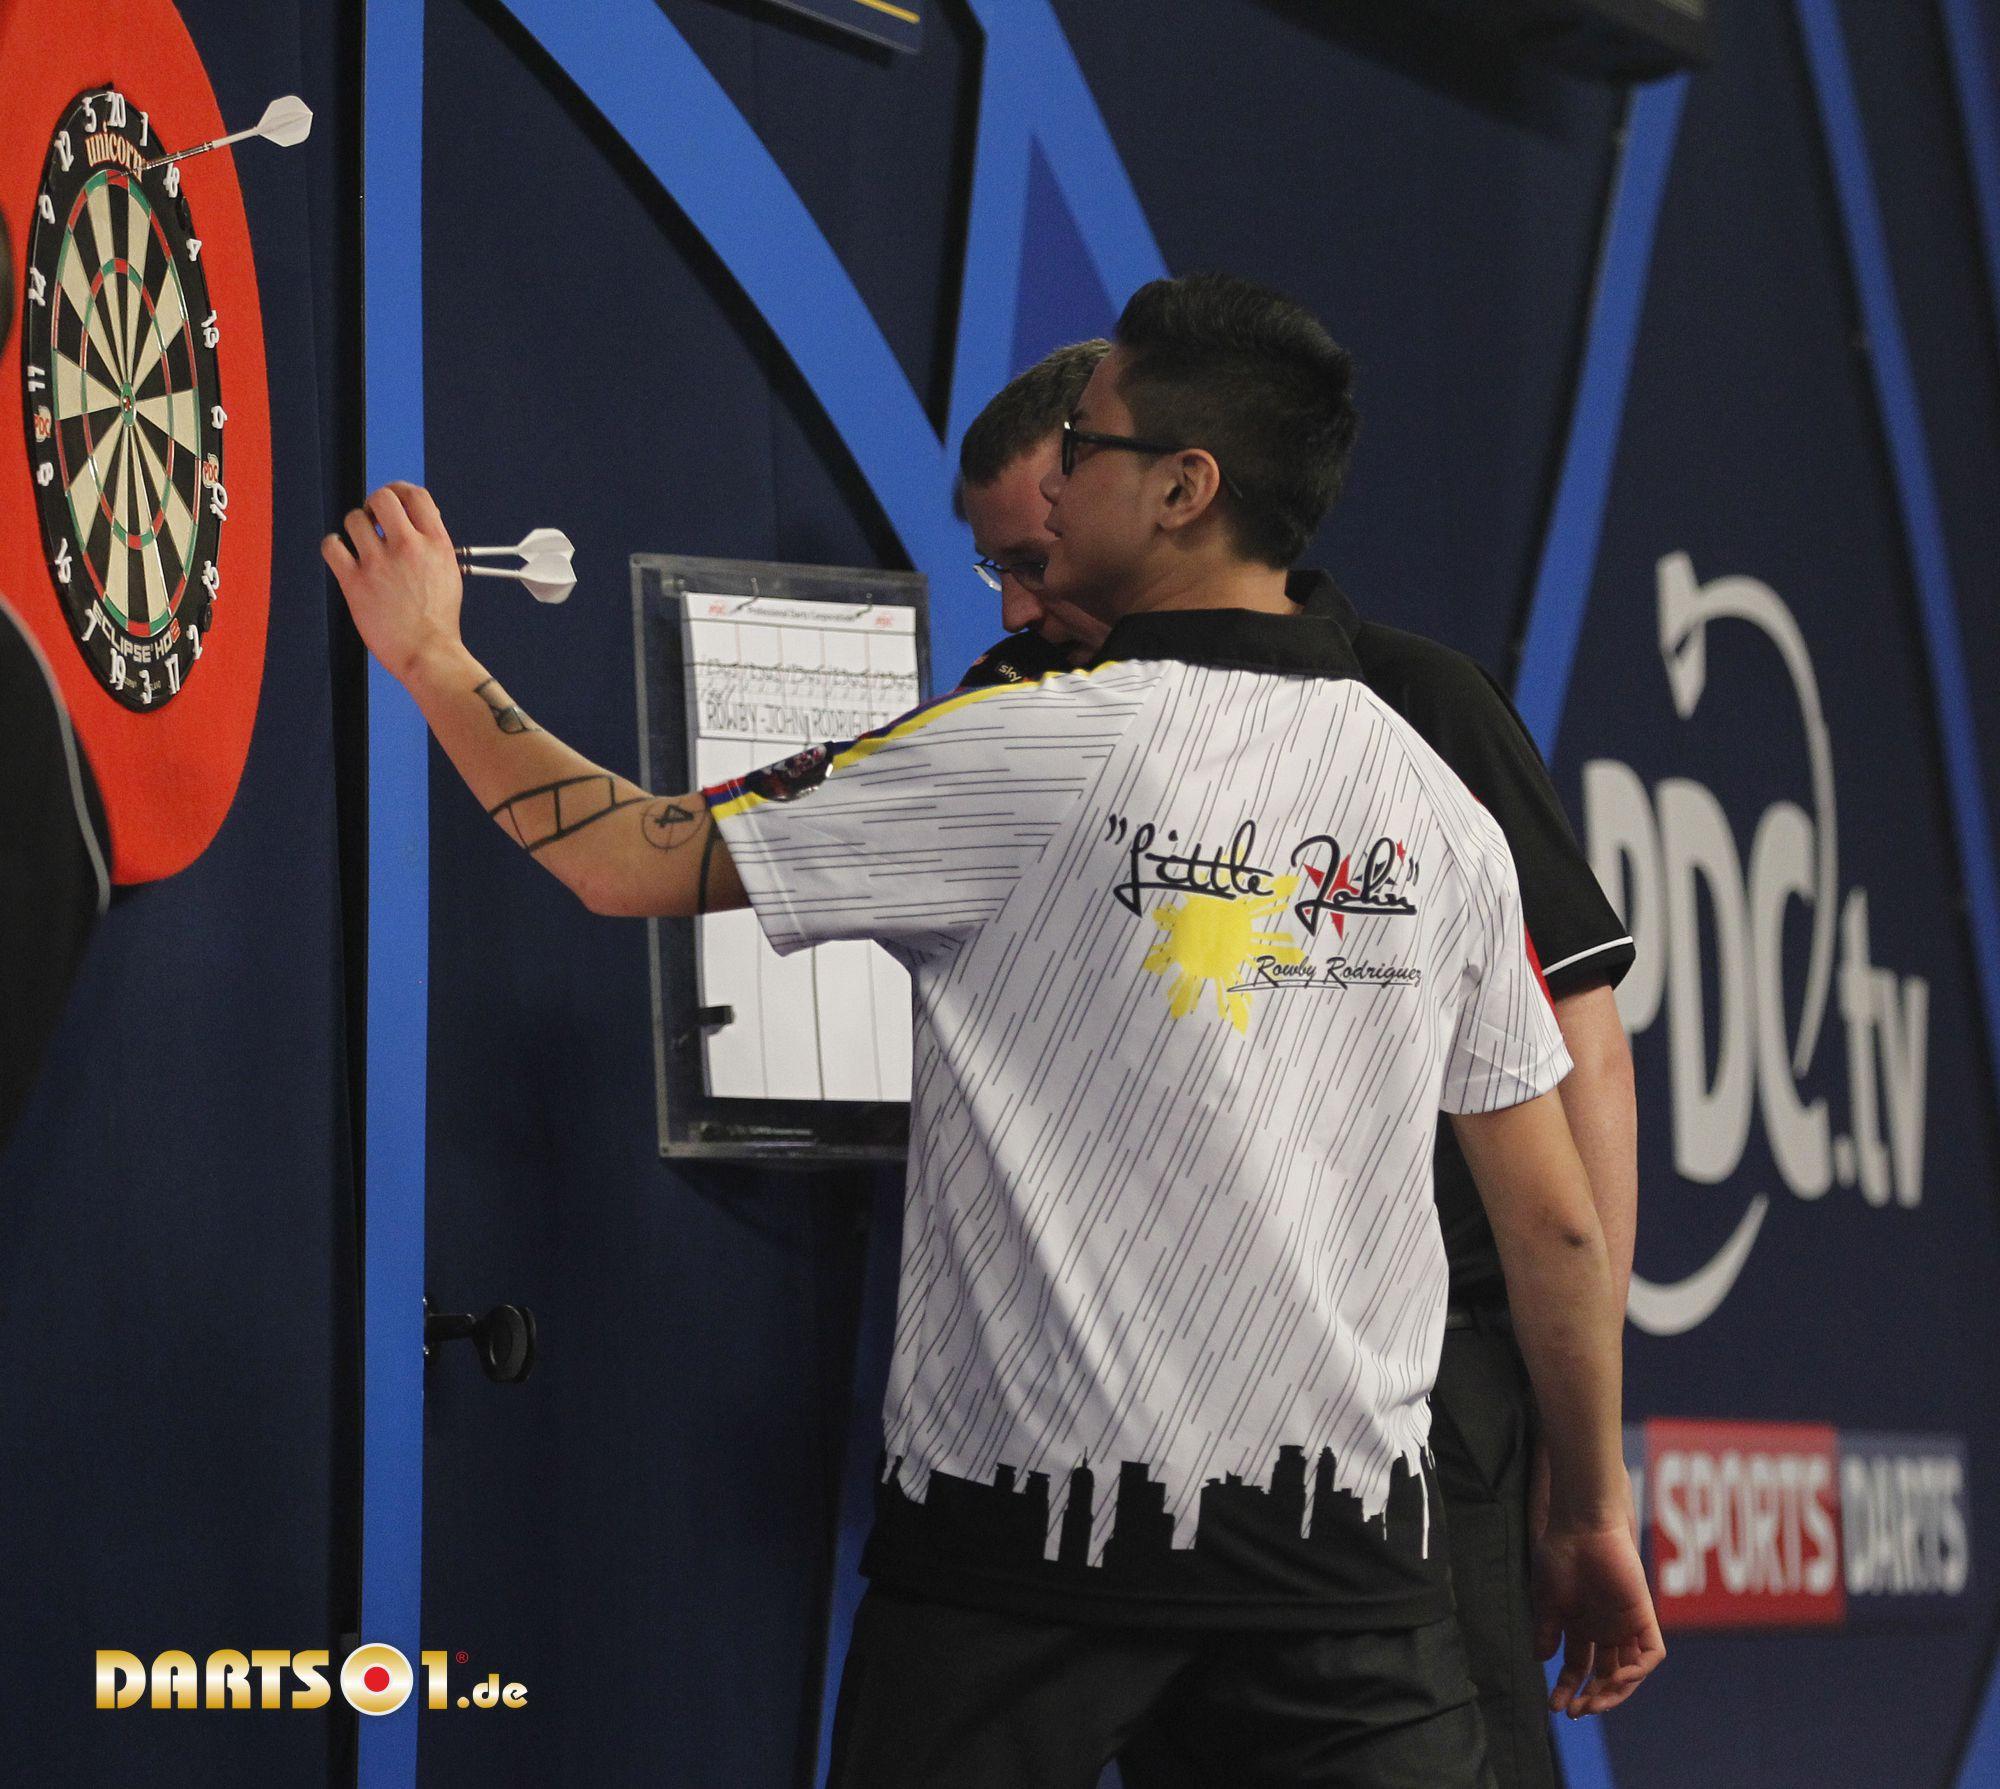 rowby john rodriguez darts